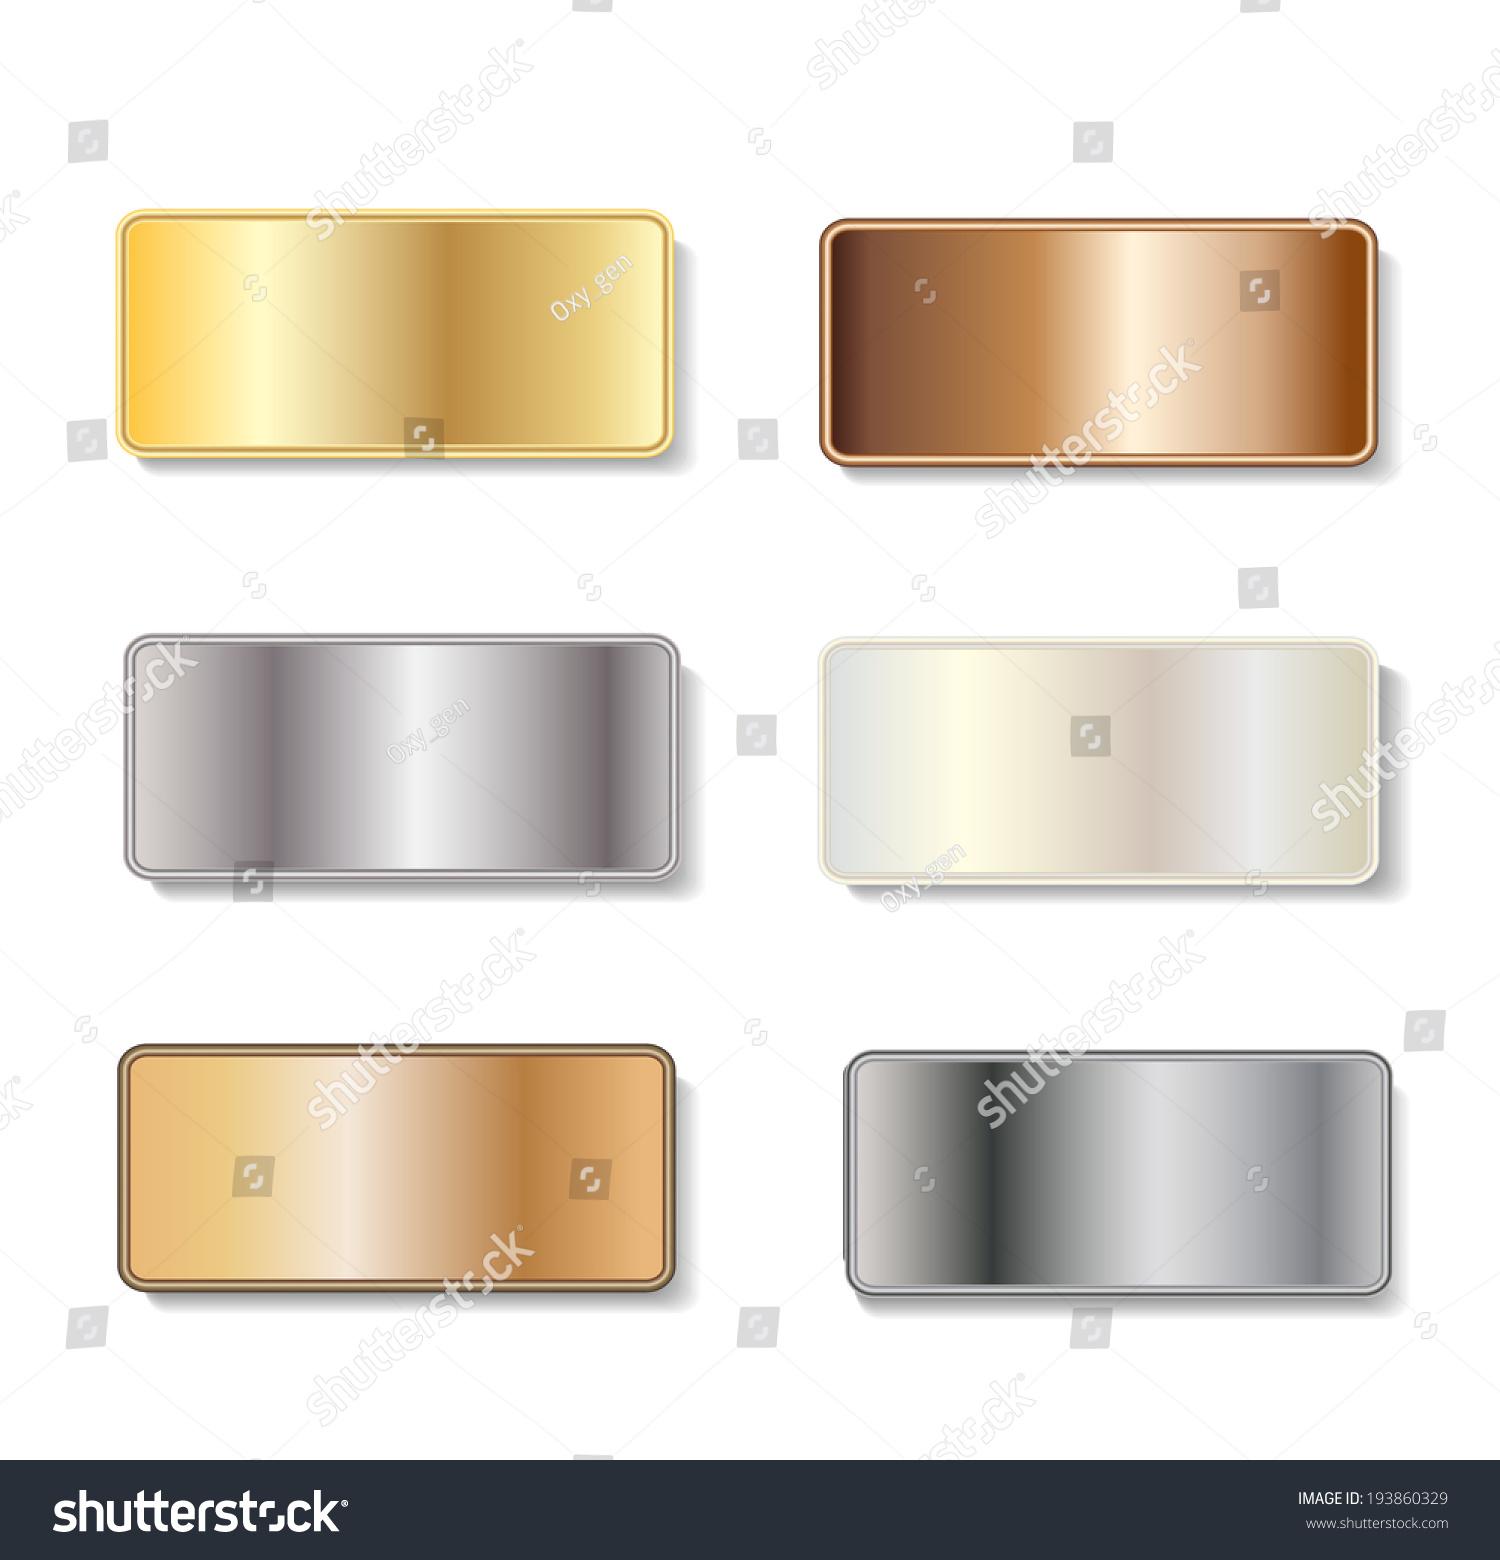 Picture of: Vector De Stock Libre De Regalias Sobre Metal Door Plaques Gold Silver Brass193860329